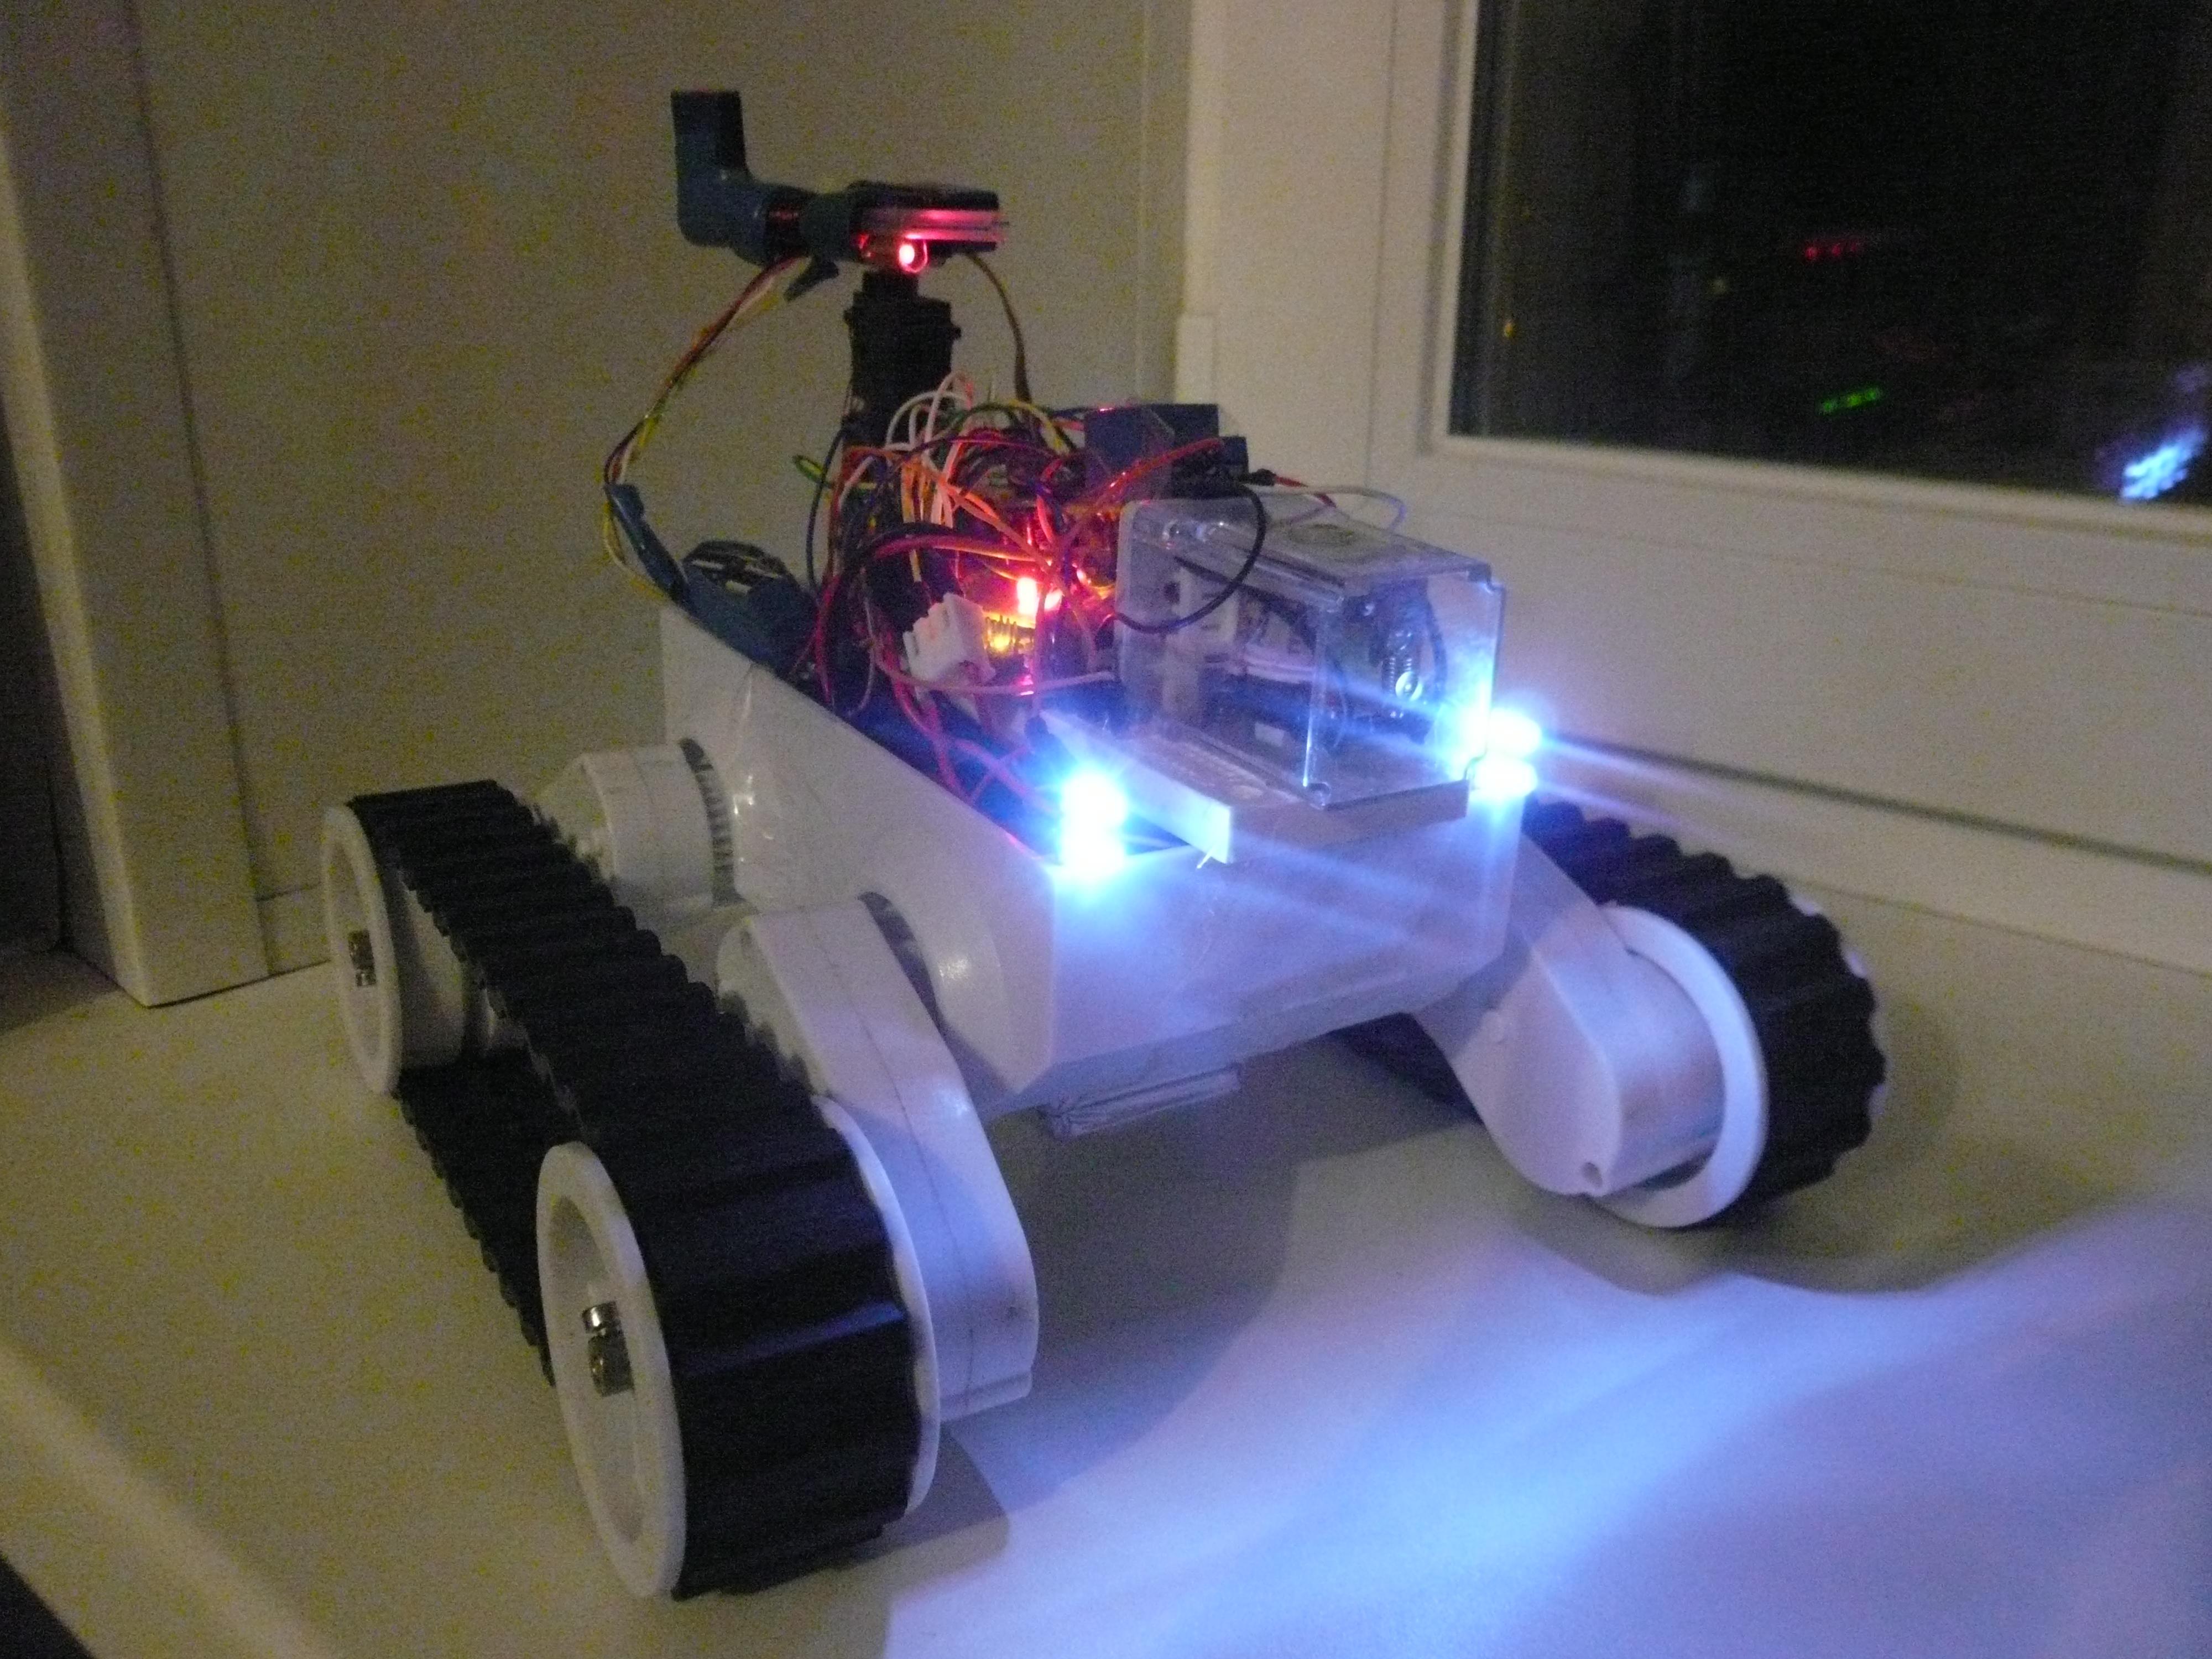 Arduino Robot with coil gun / gauss gun drone